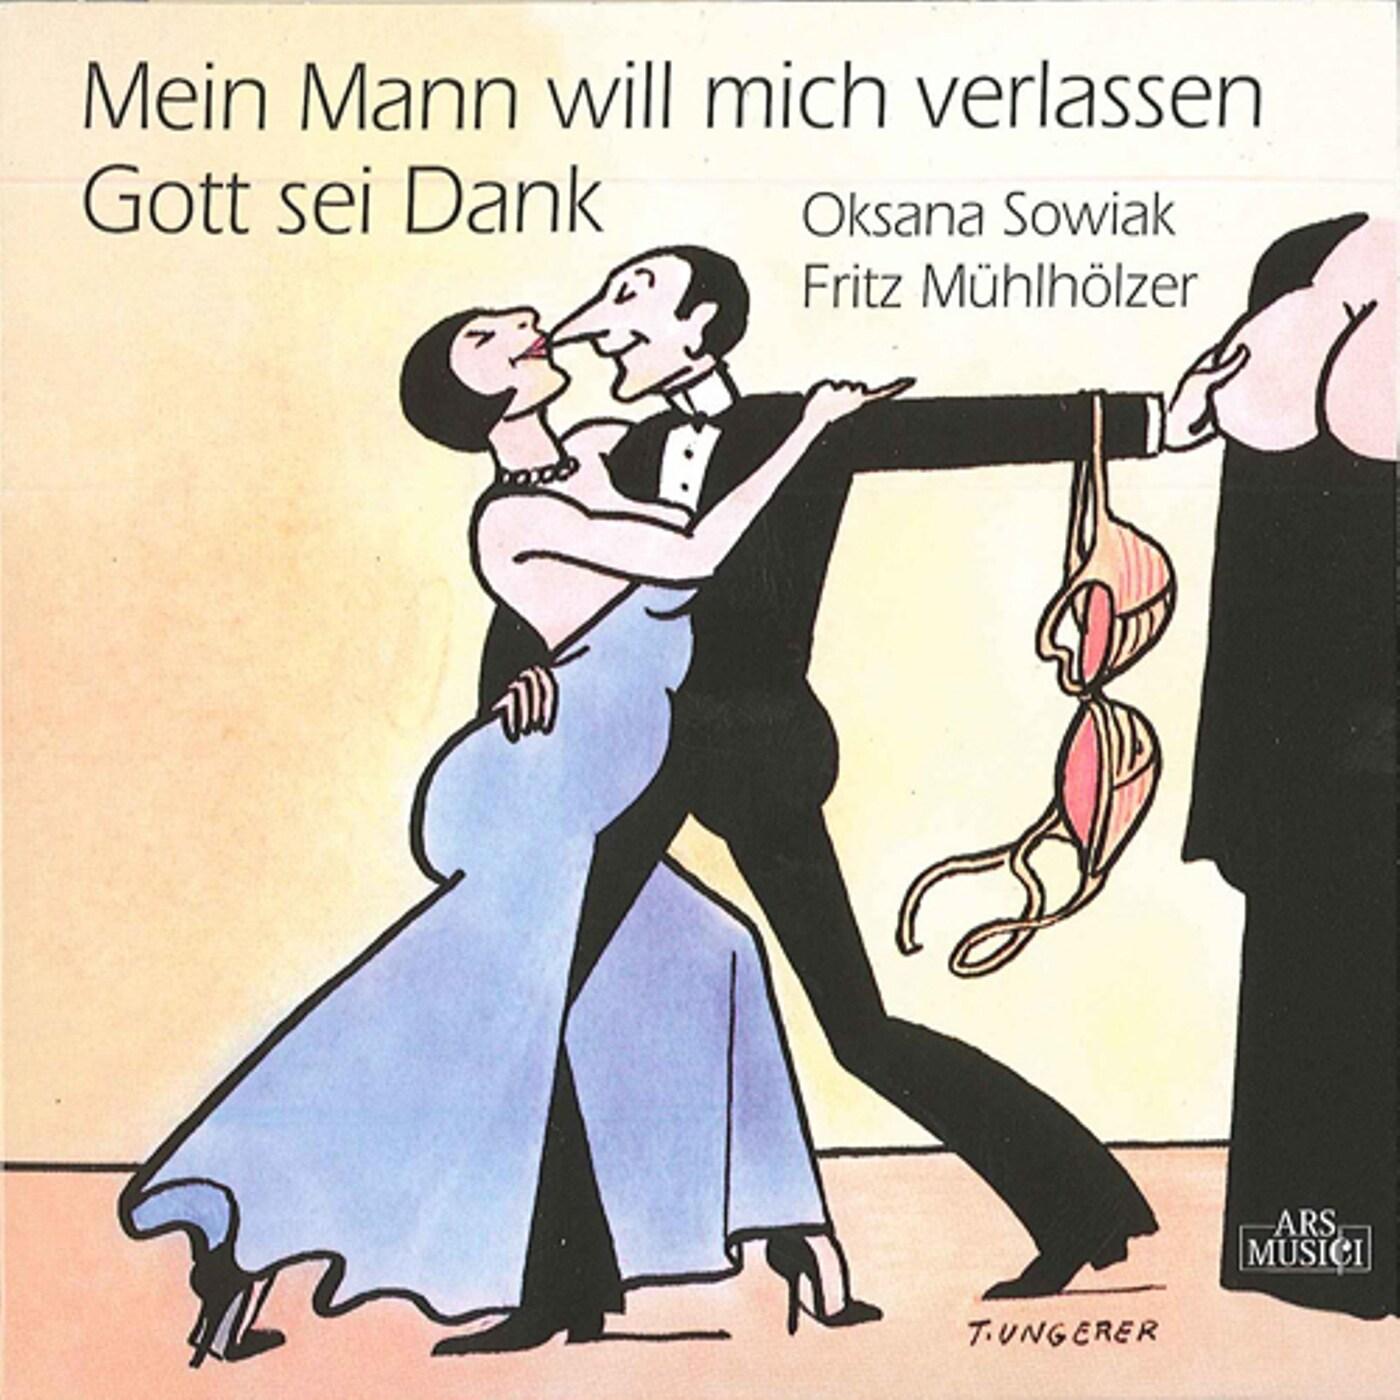 Knut Vaage - Knut: My Husband Wants to Leave Me, Thank God! (Mein Mann Will Mich Verlassen, Gott Sein Dank)